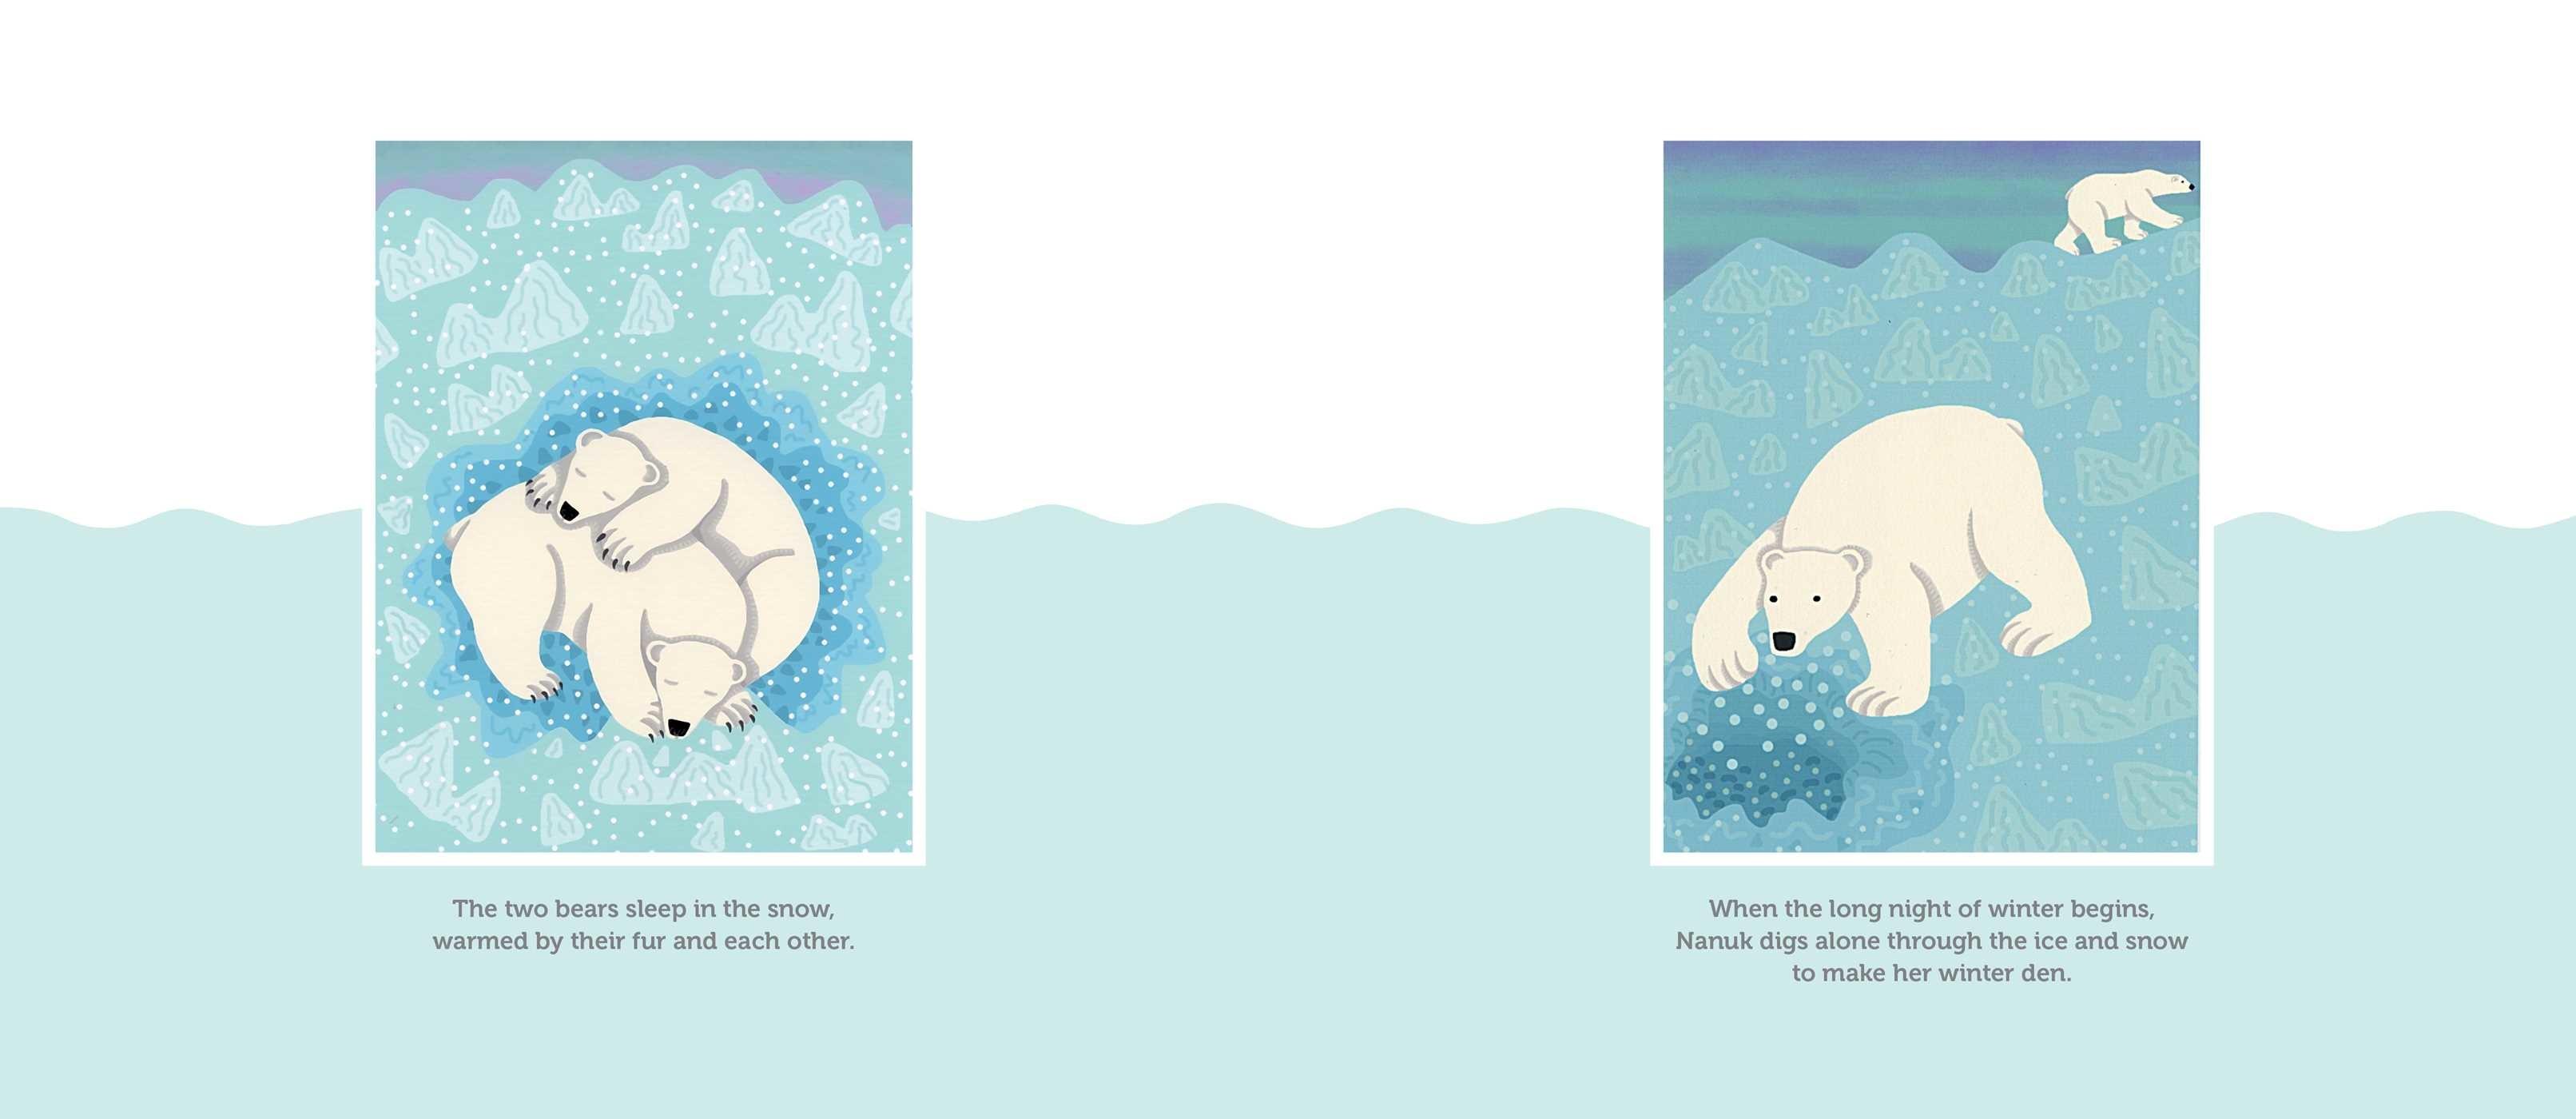 Nanuk the ice bear 9781481446679.in04